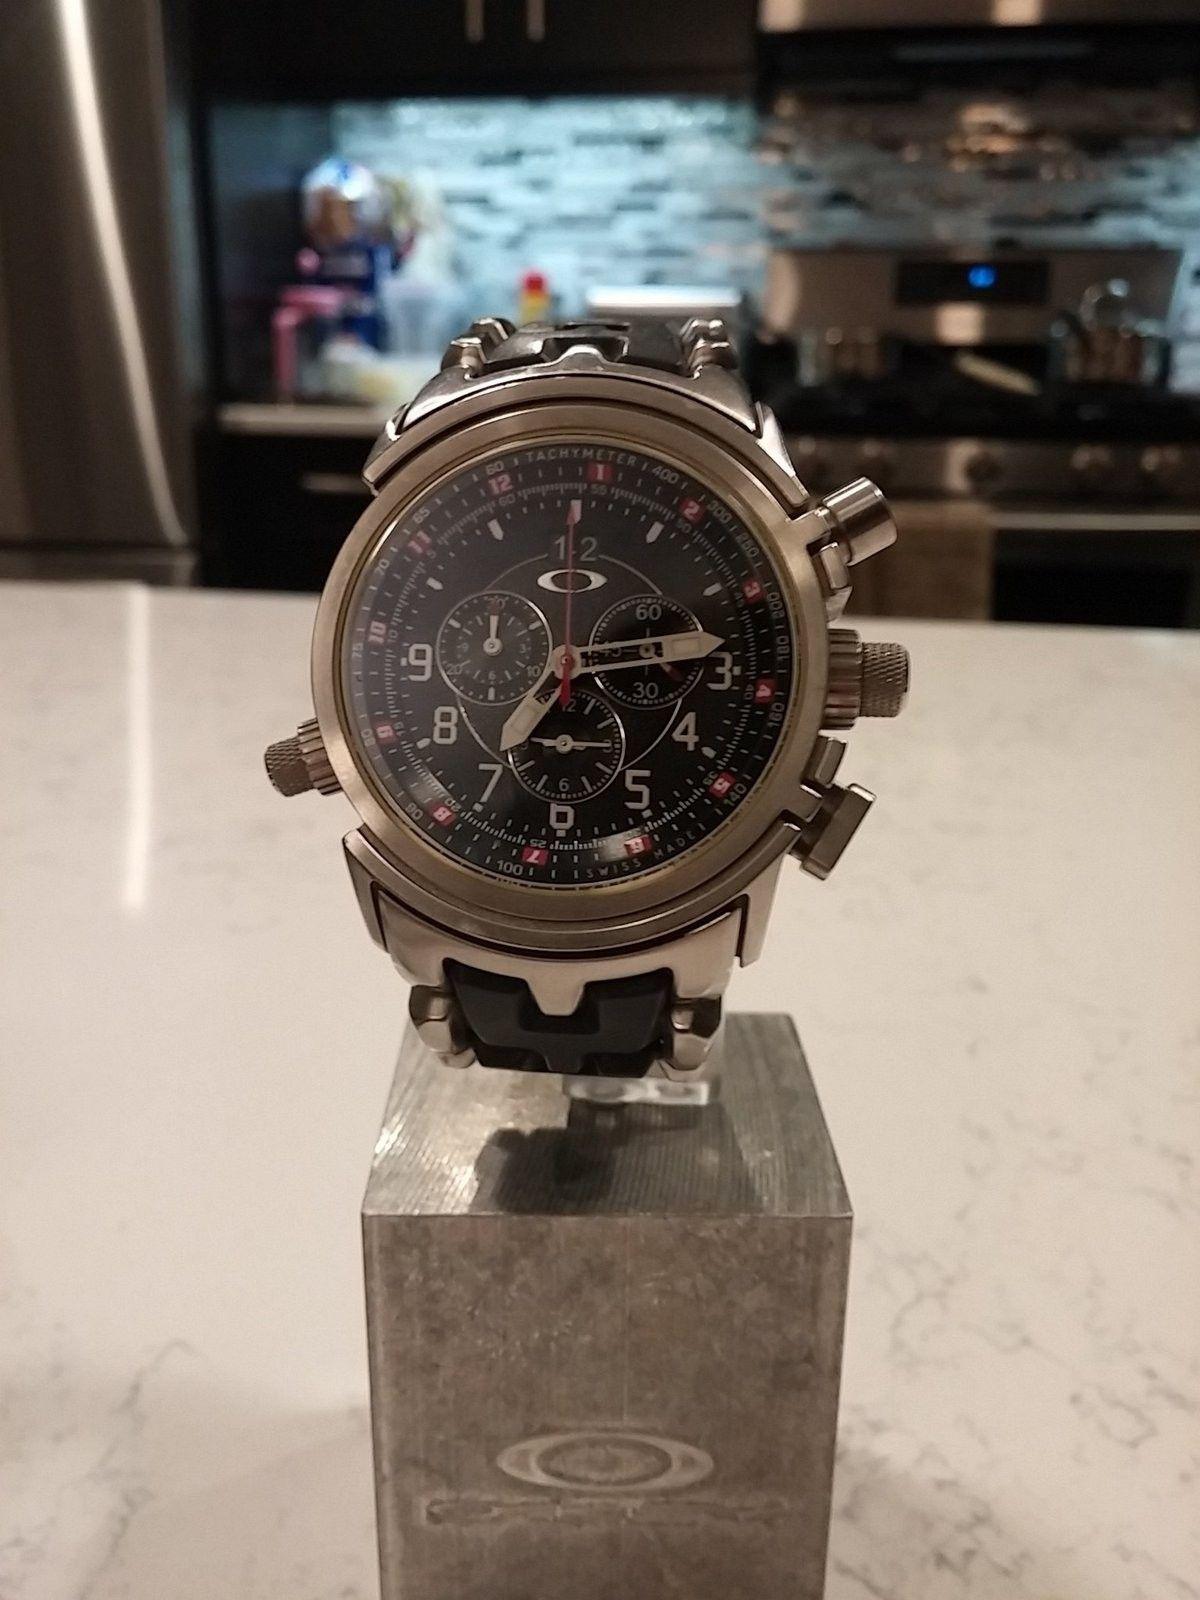 Watch Sale v2.0 - Timebomb x3, 12 Gauge, Minute Machine, Judge, Blade - 20150315_201358.jpg